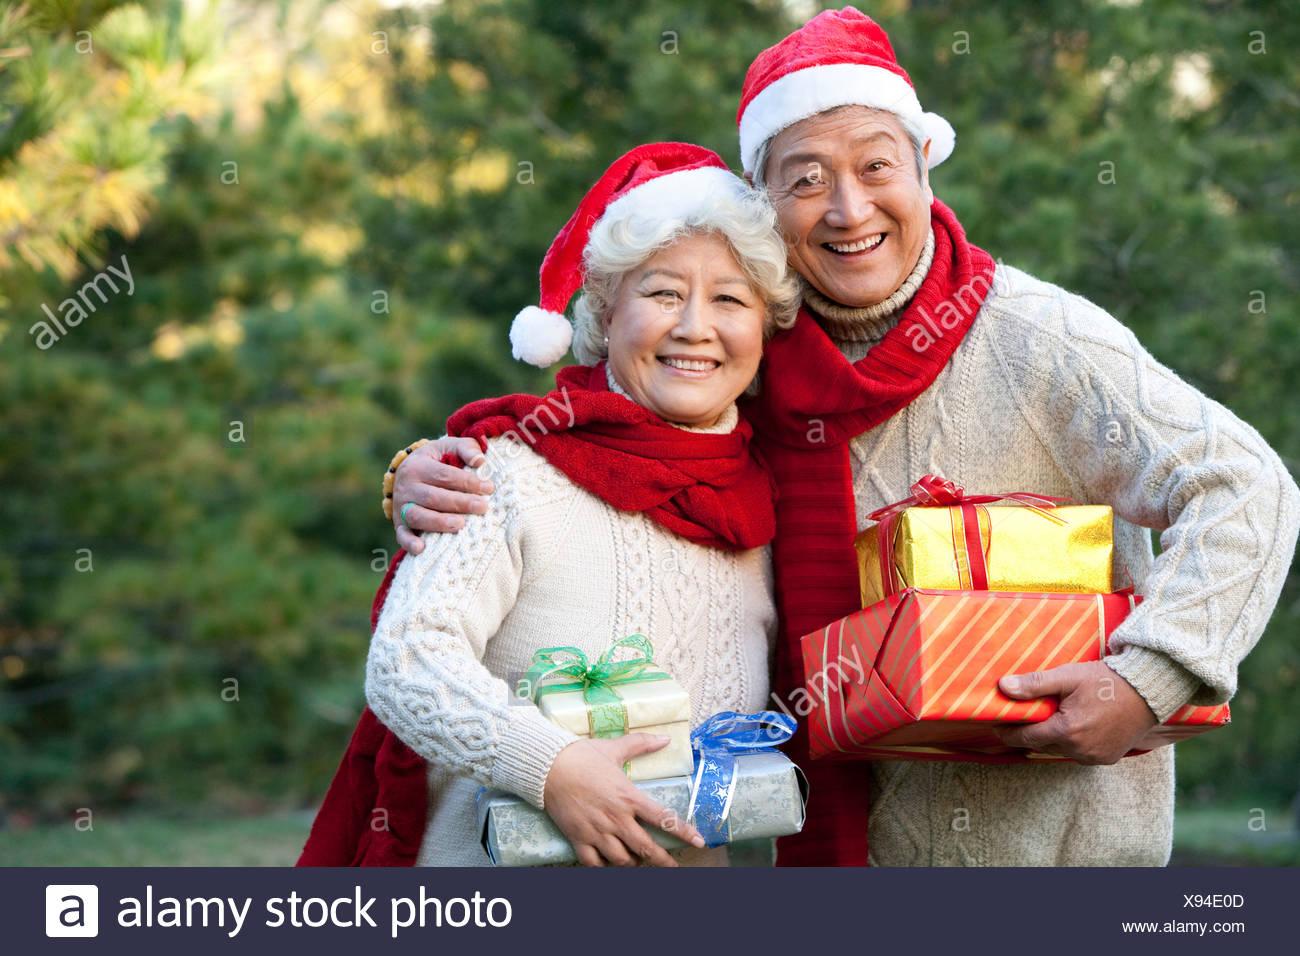 Älteres Paar in Santa Hüte halten Weihnachtsgeschenke Stockfoto ...